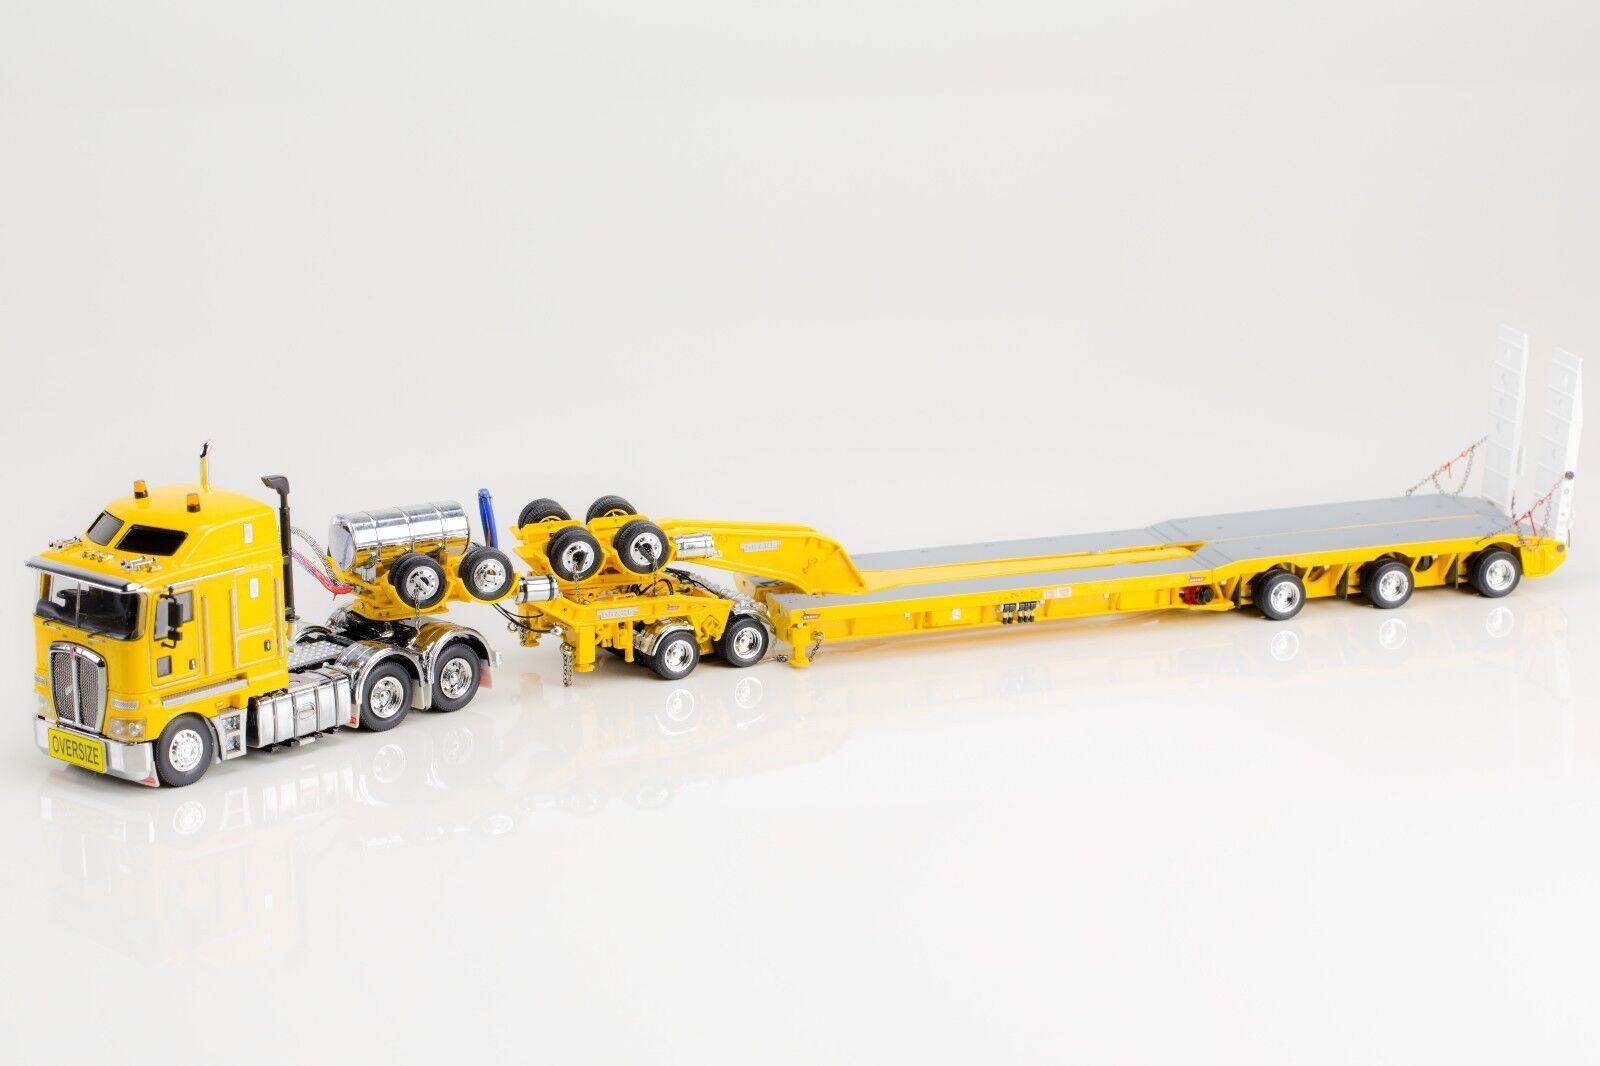 KENWORTH K200 with DRAKE 2x8 DOLLY & 3x8 LOWLOADER - CHROME YELLOW